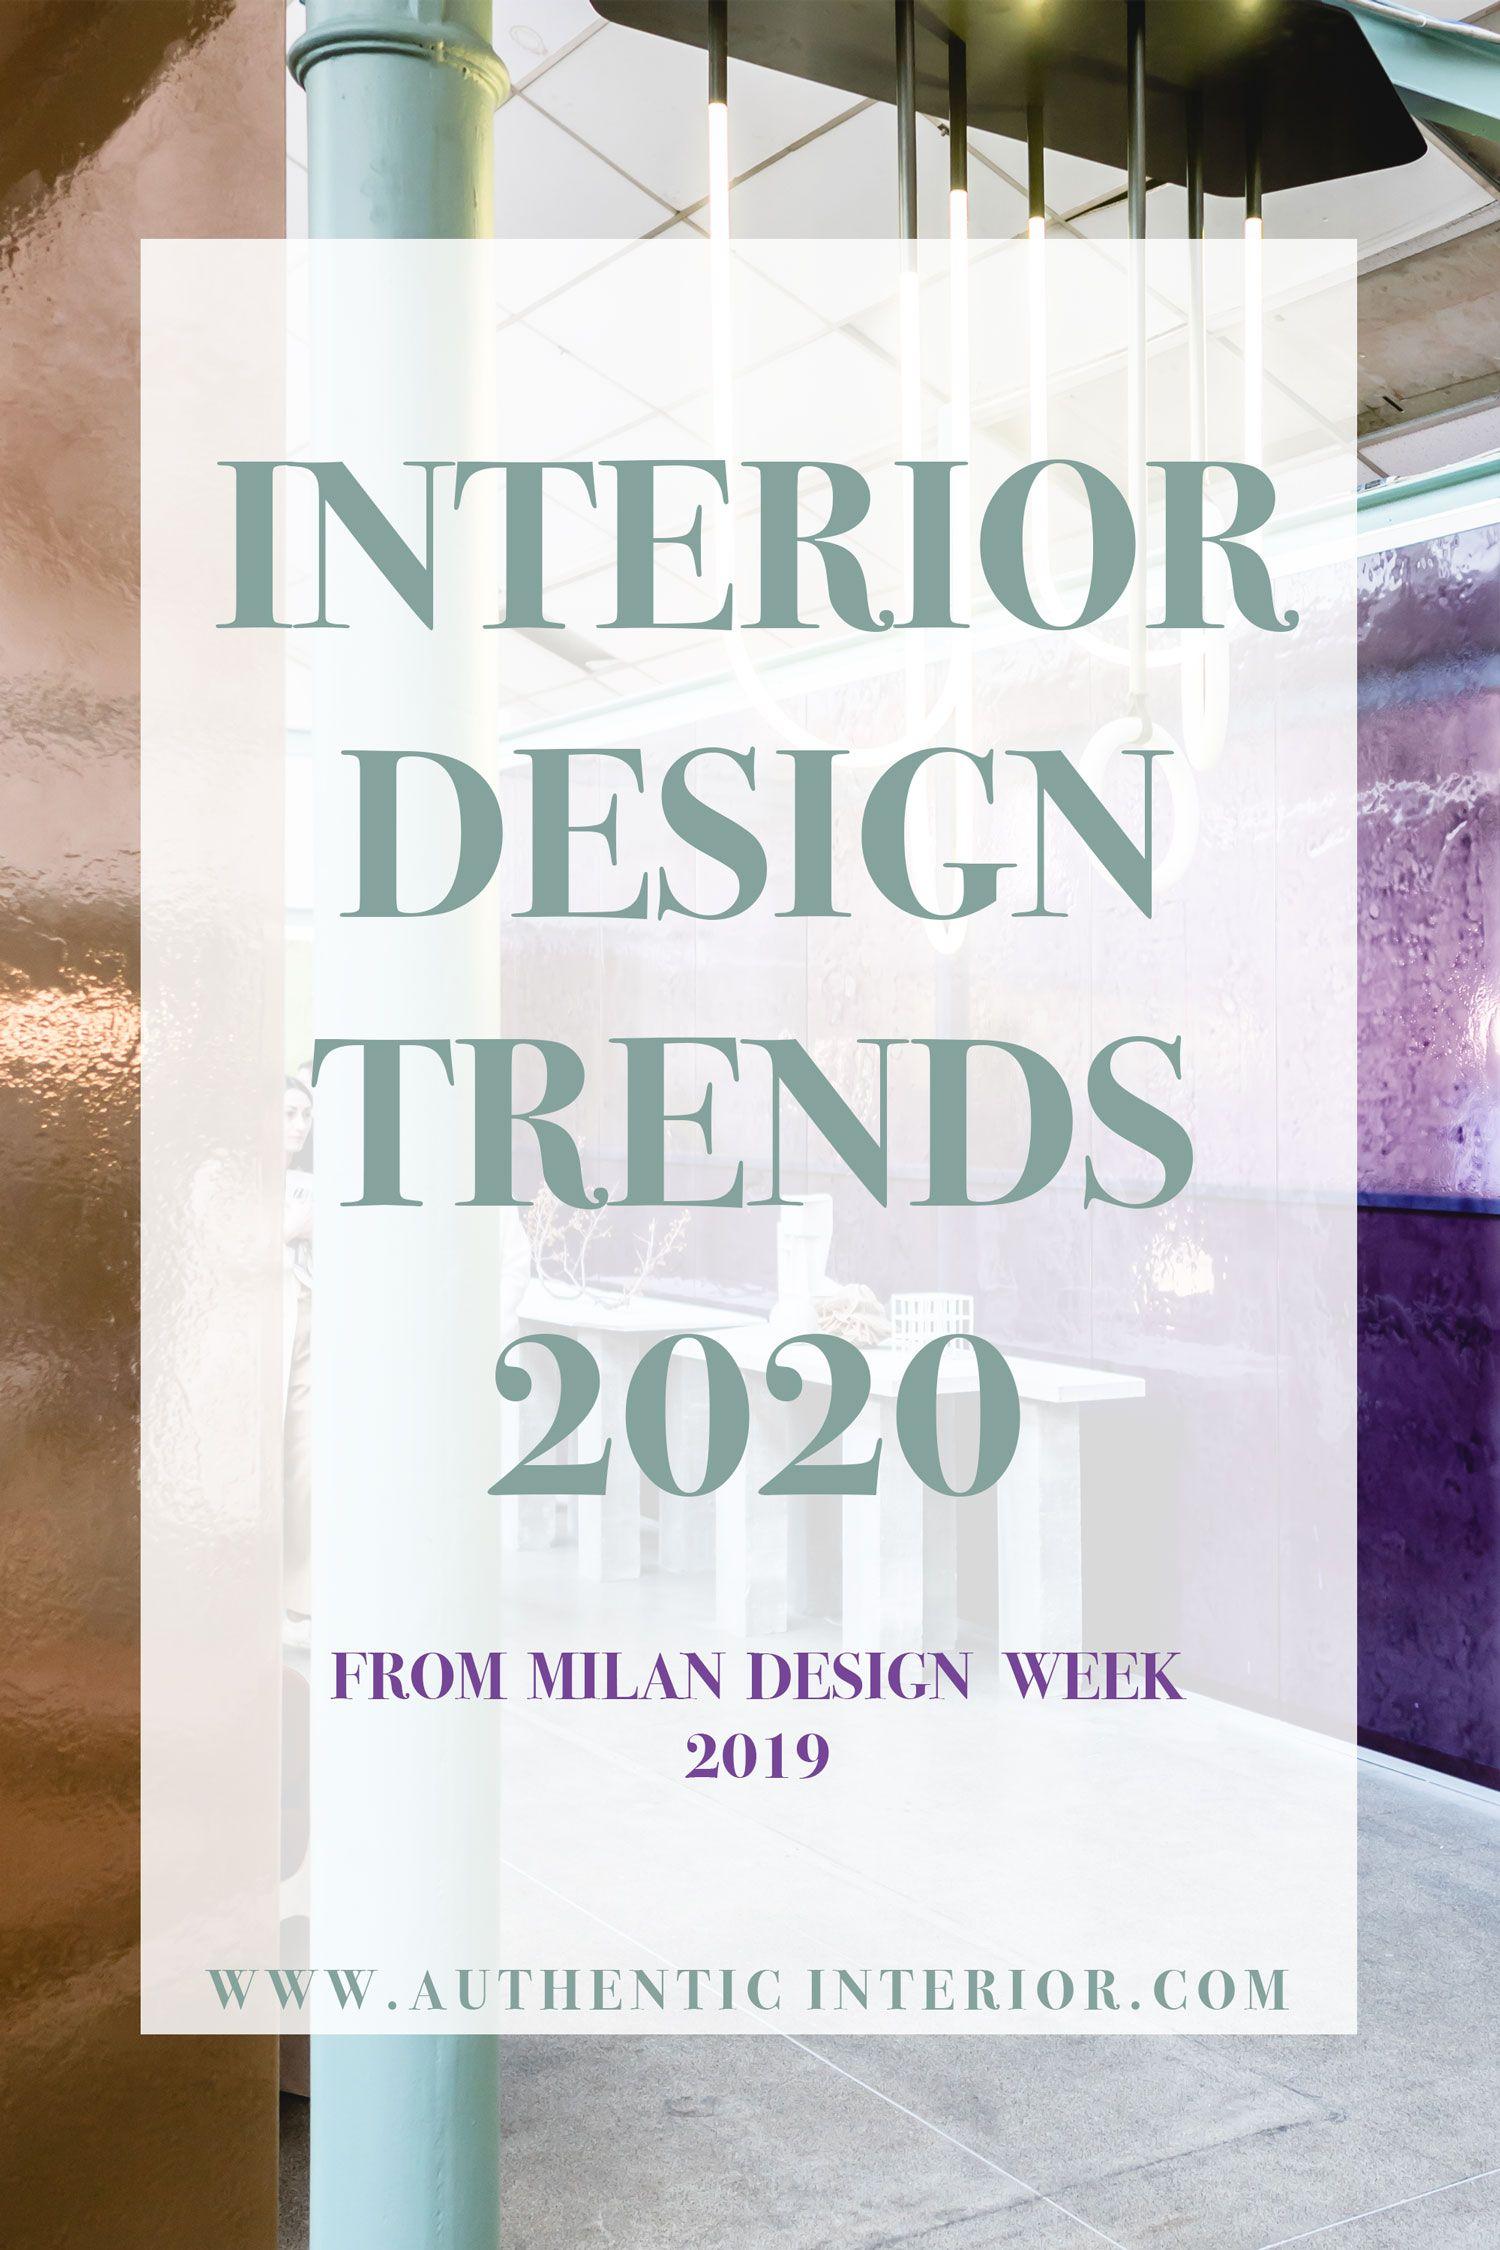 Salon Du Design Milan 2019 interior design trends for 2020 from milan design week 2019